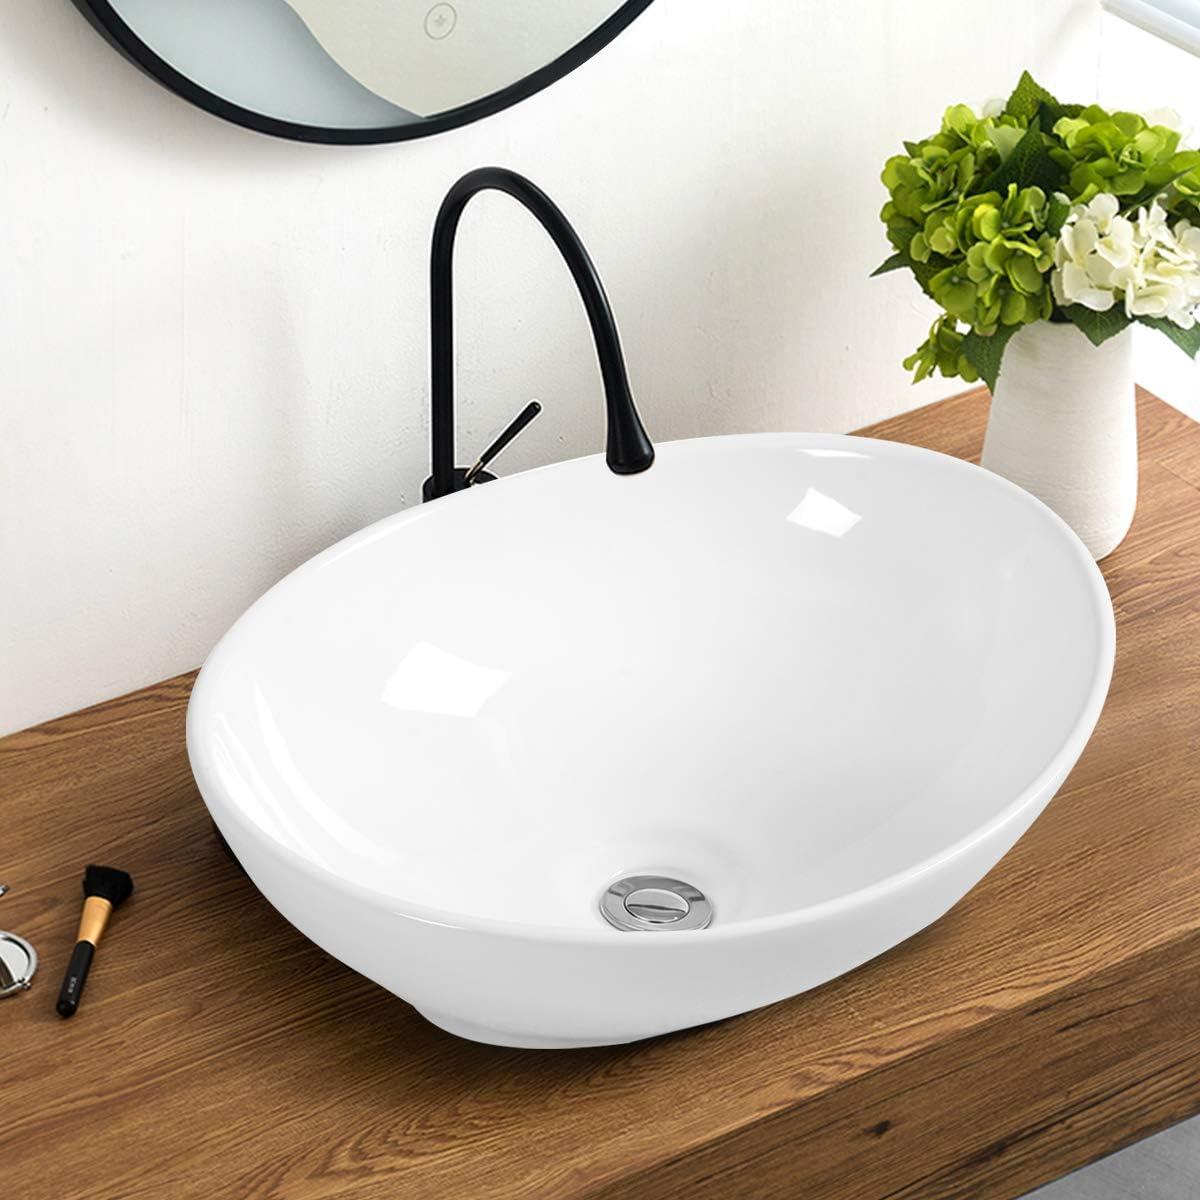 Giantex Vessel Sink 16x13 Inch Basin Porcelain W Pop Up Drain Oval Bathroom Ceramic Sink Bowl Amazon Com